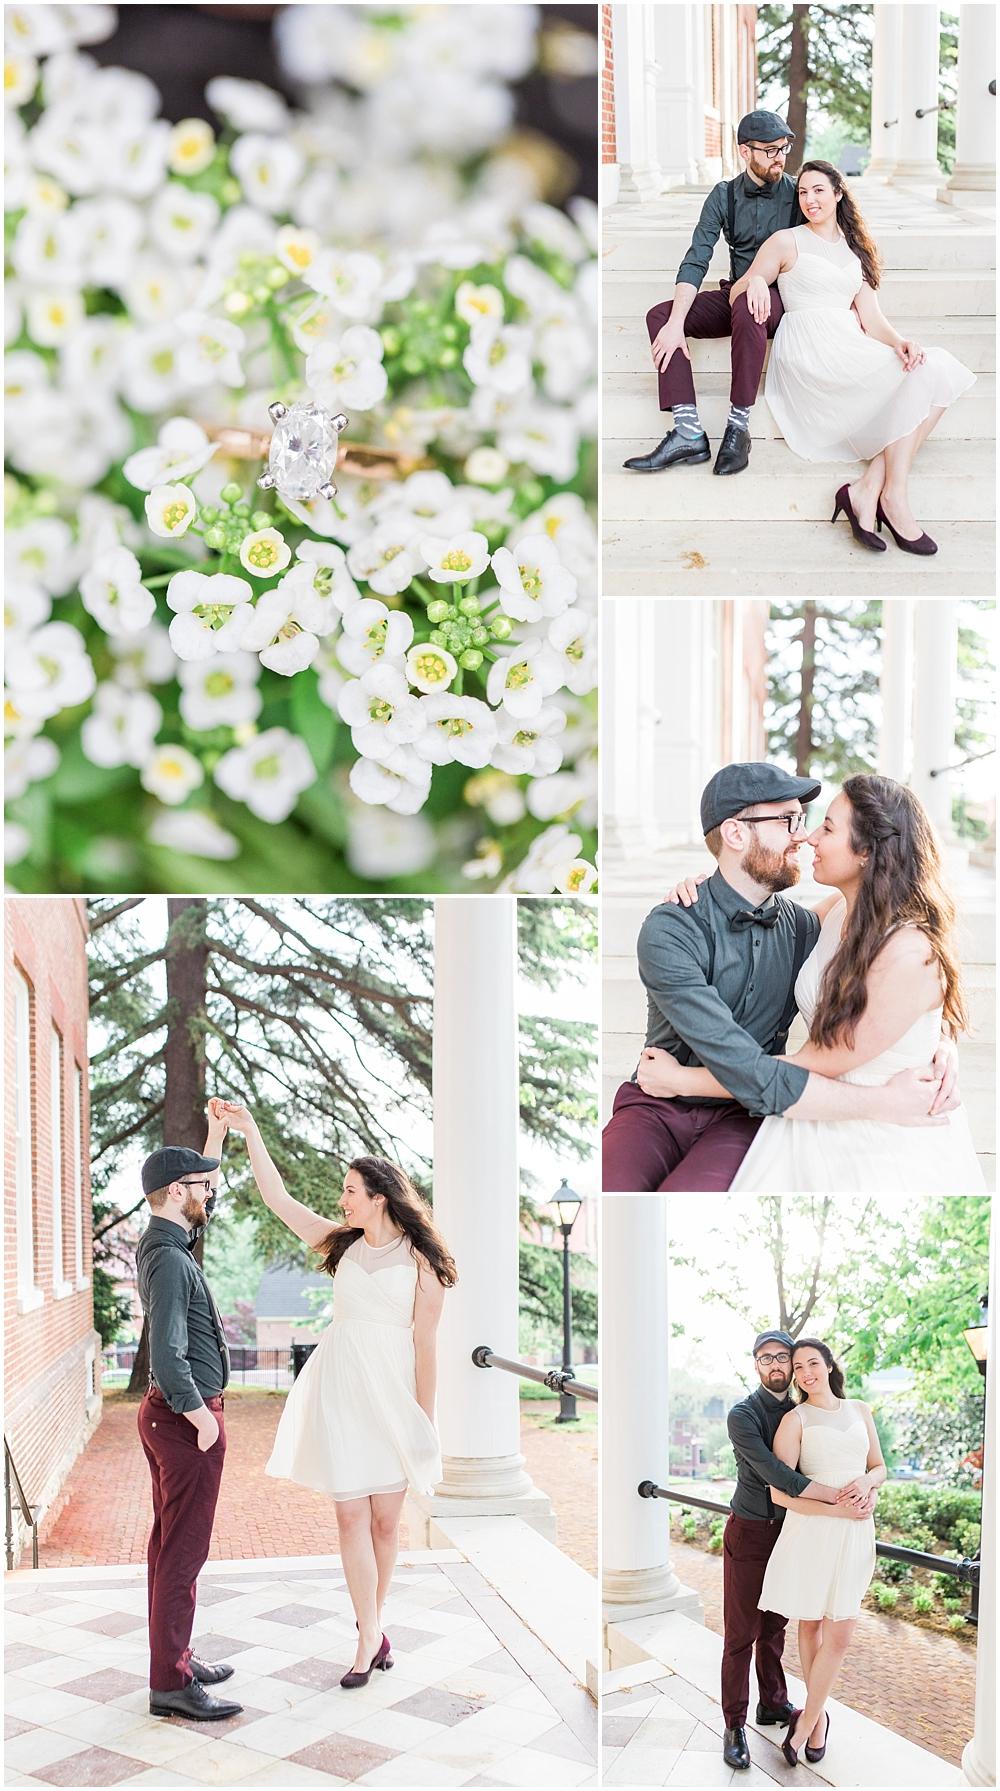 Downtown-Annapolis-Engagement-Photographer-Spring-1783-UP!-Disney-09-11_0003.jpg